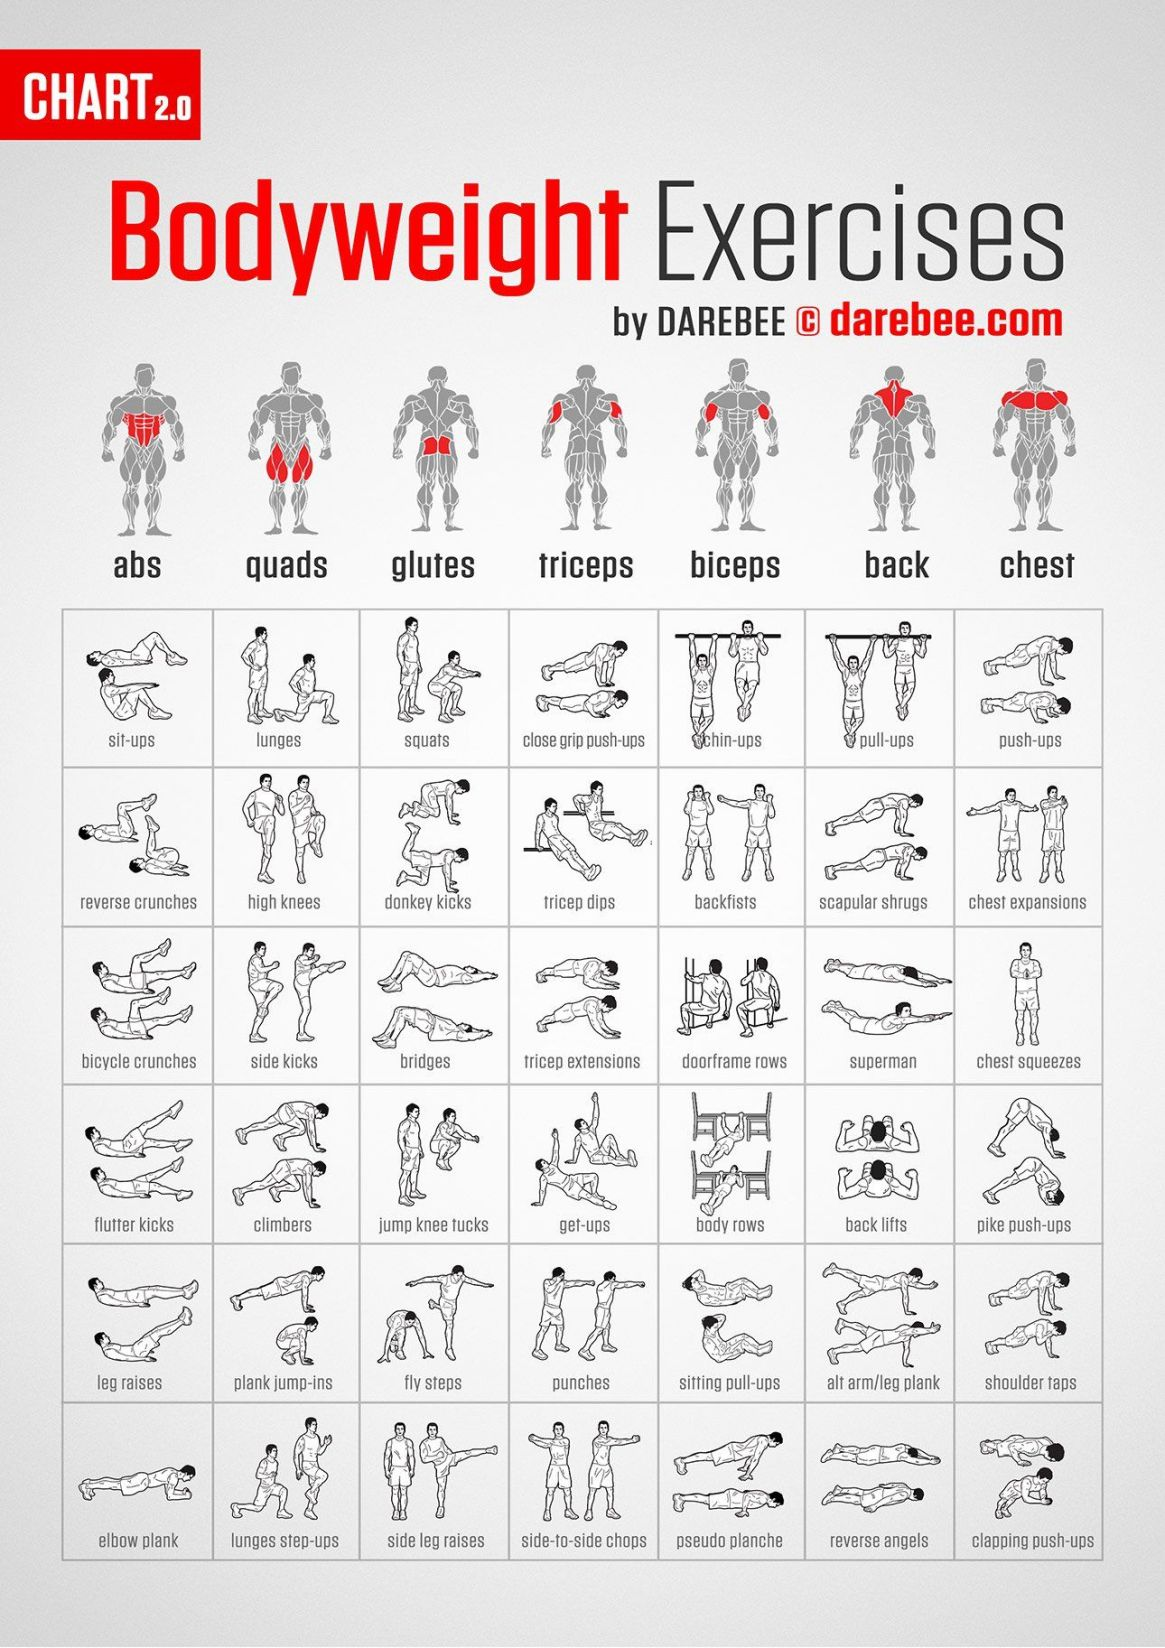 Bodyweight Exercises by Darebee